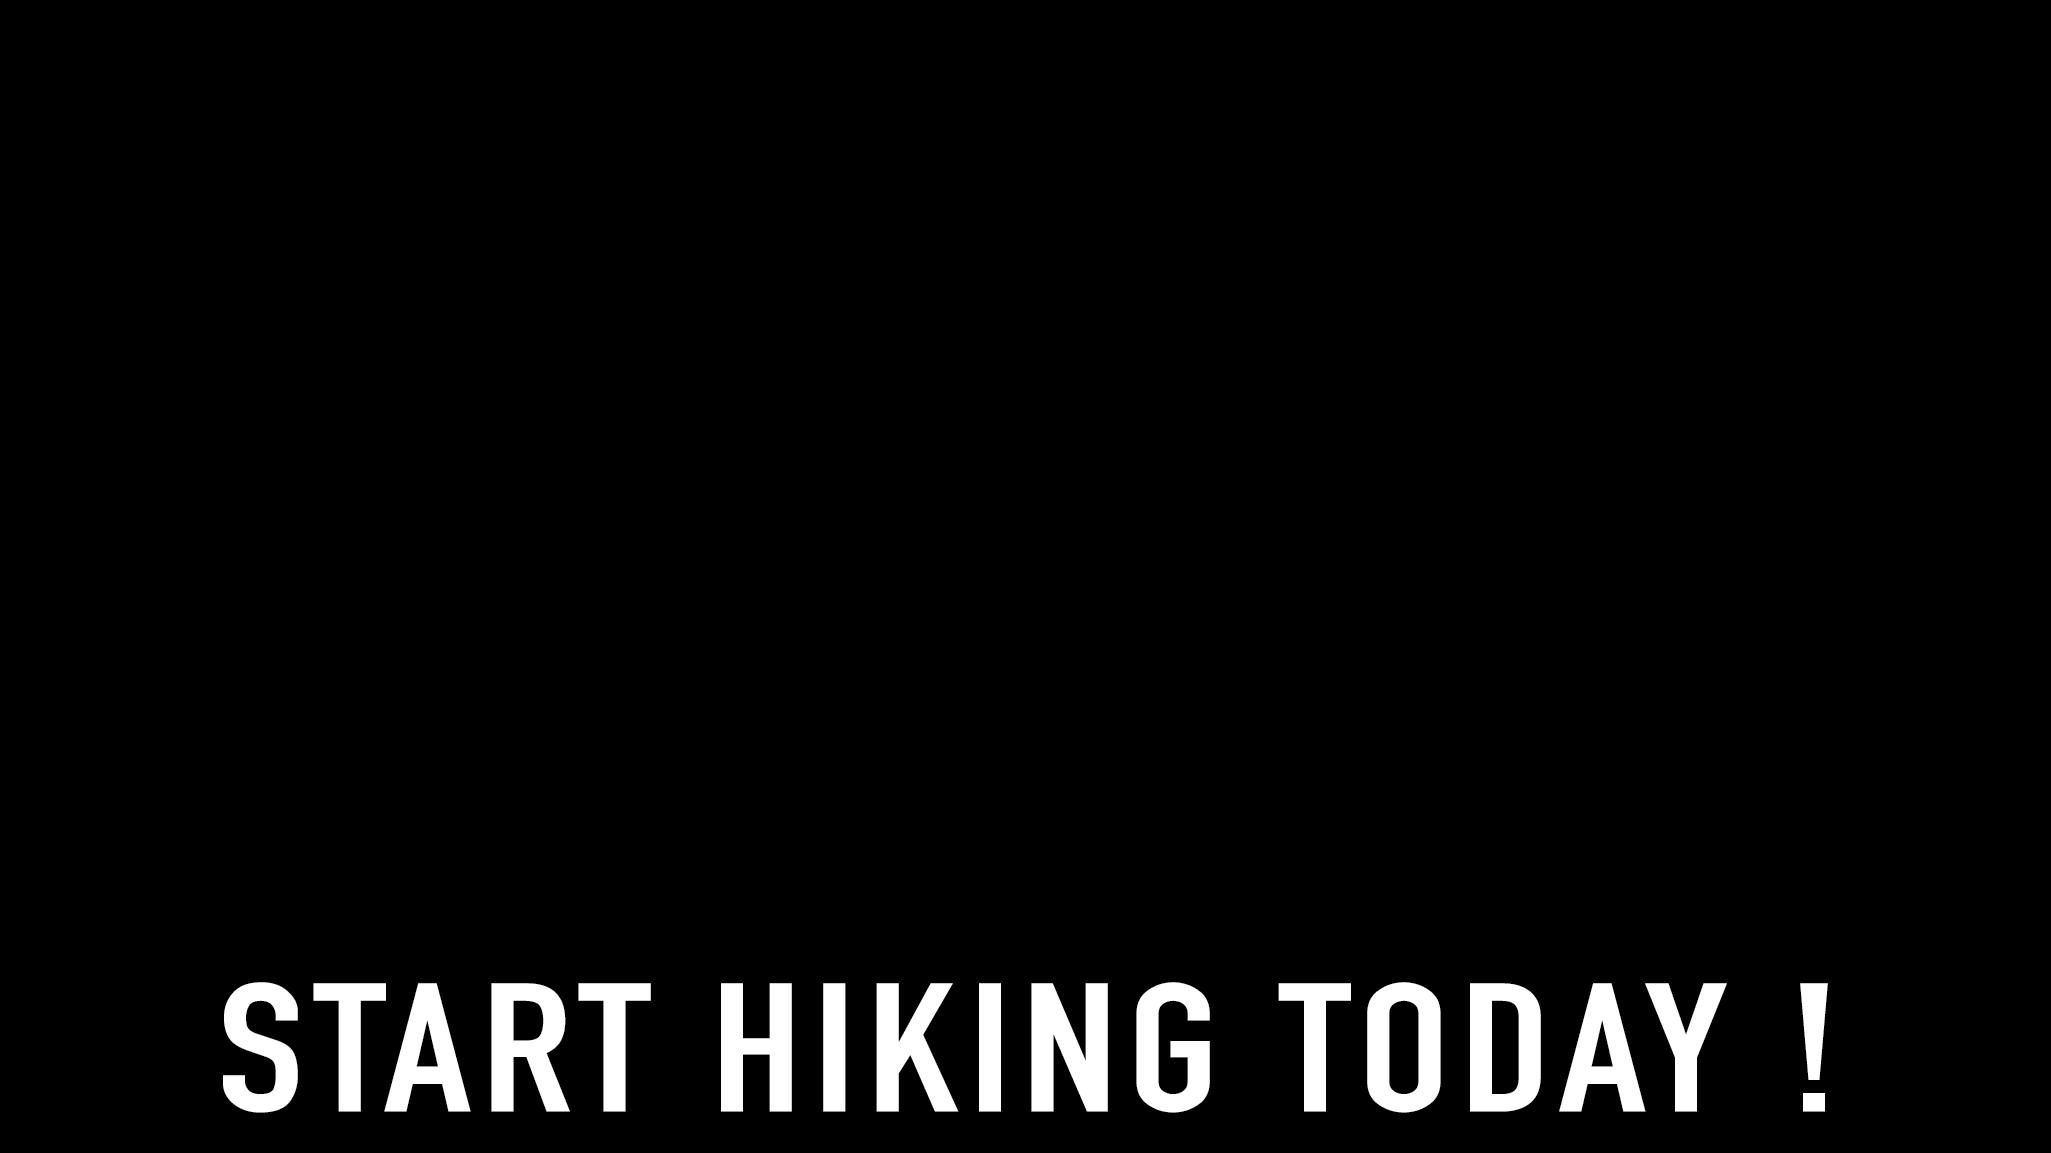 Start Hiking Today!